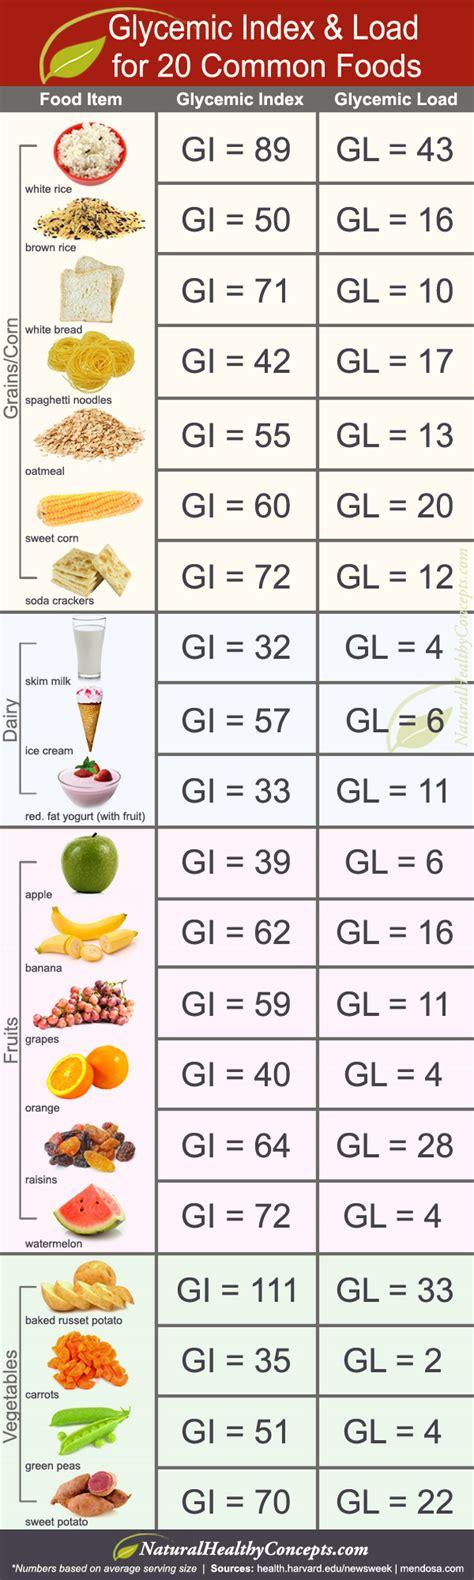 atkins diet fiber supplements picture 10